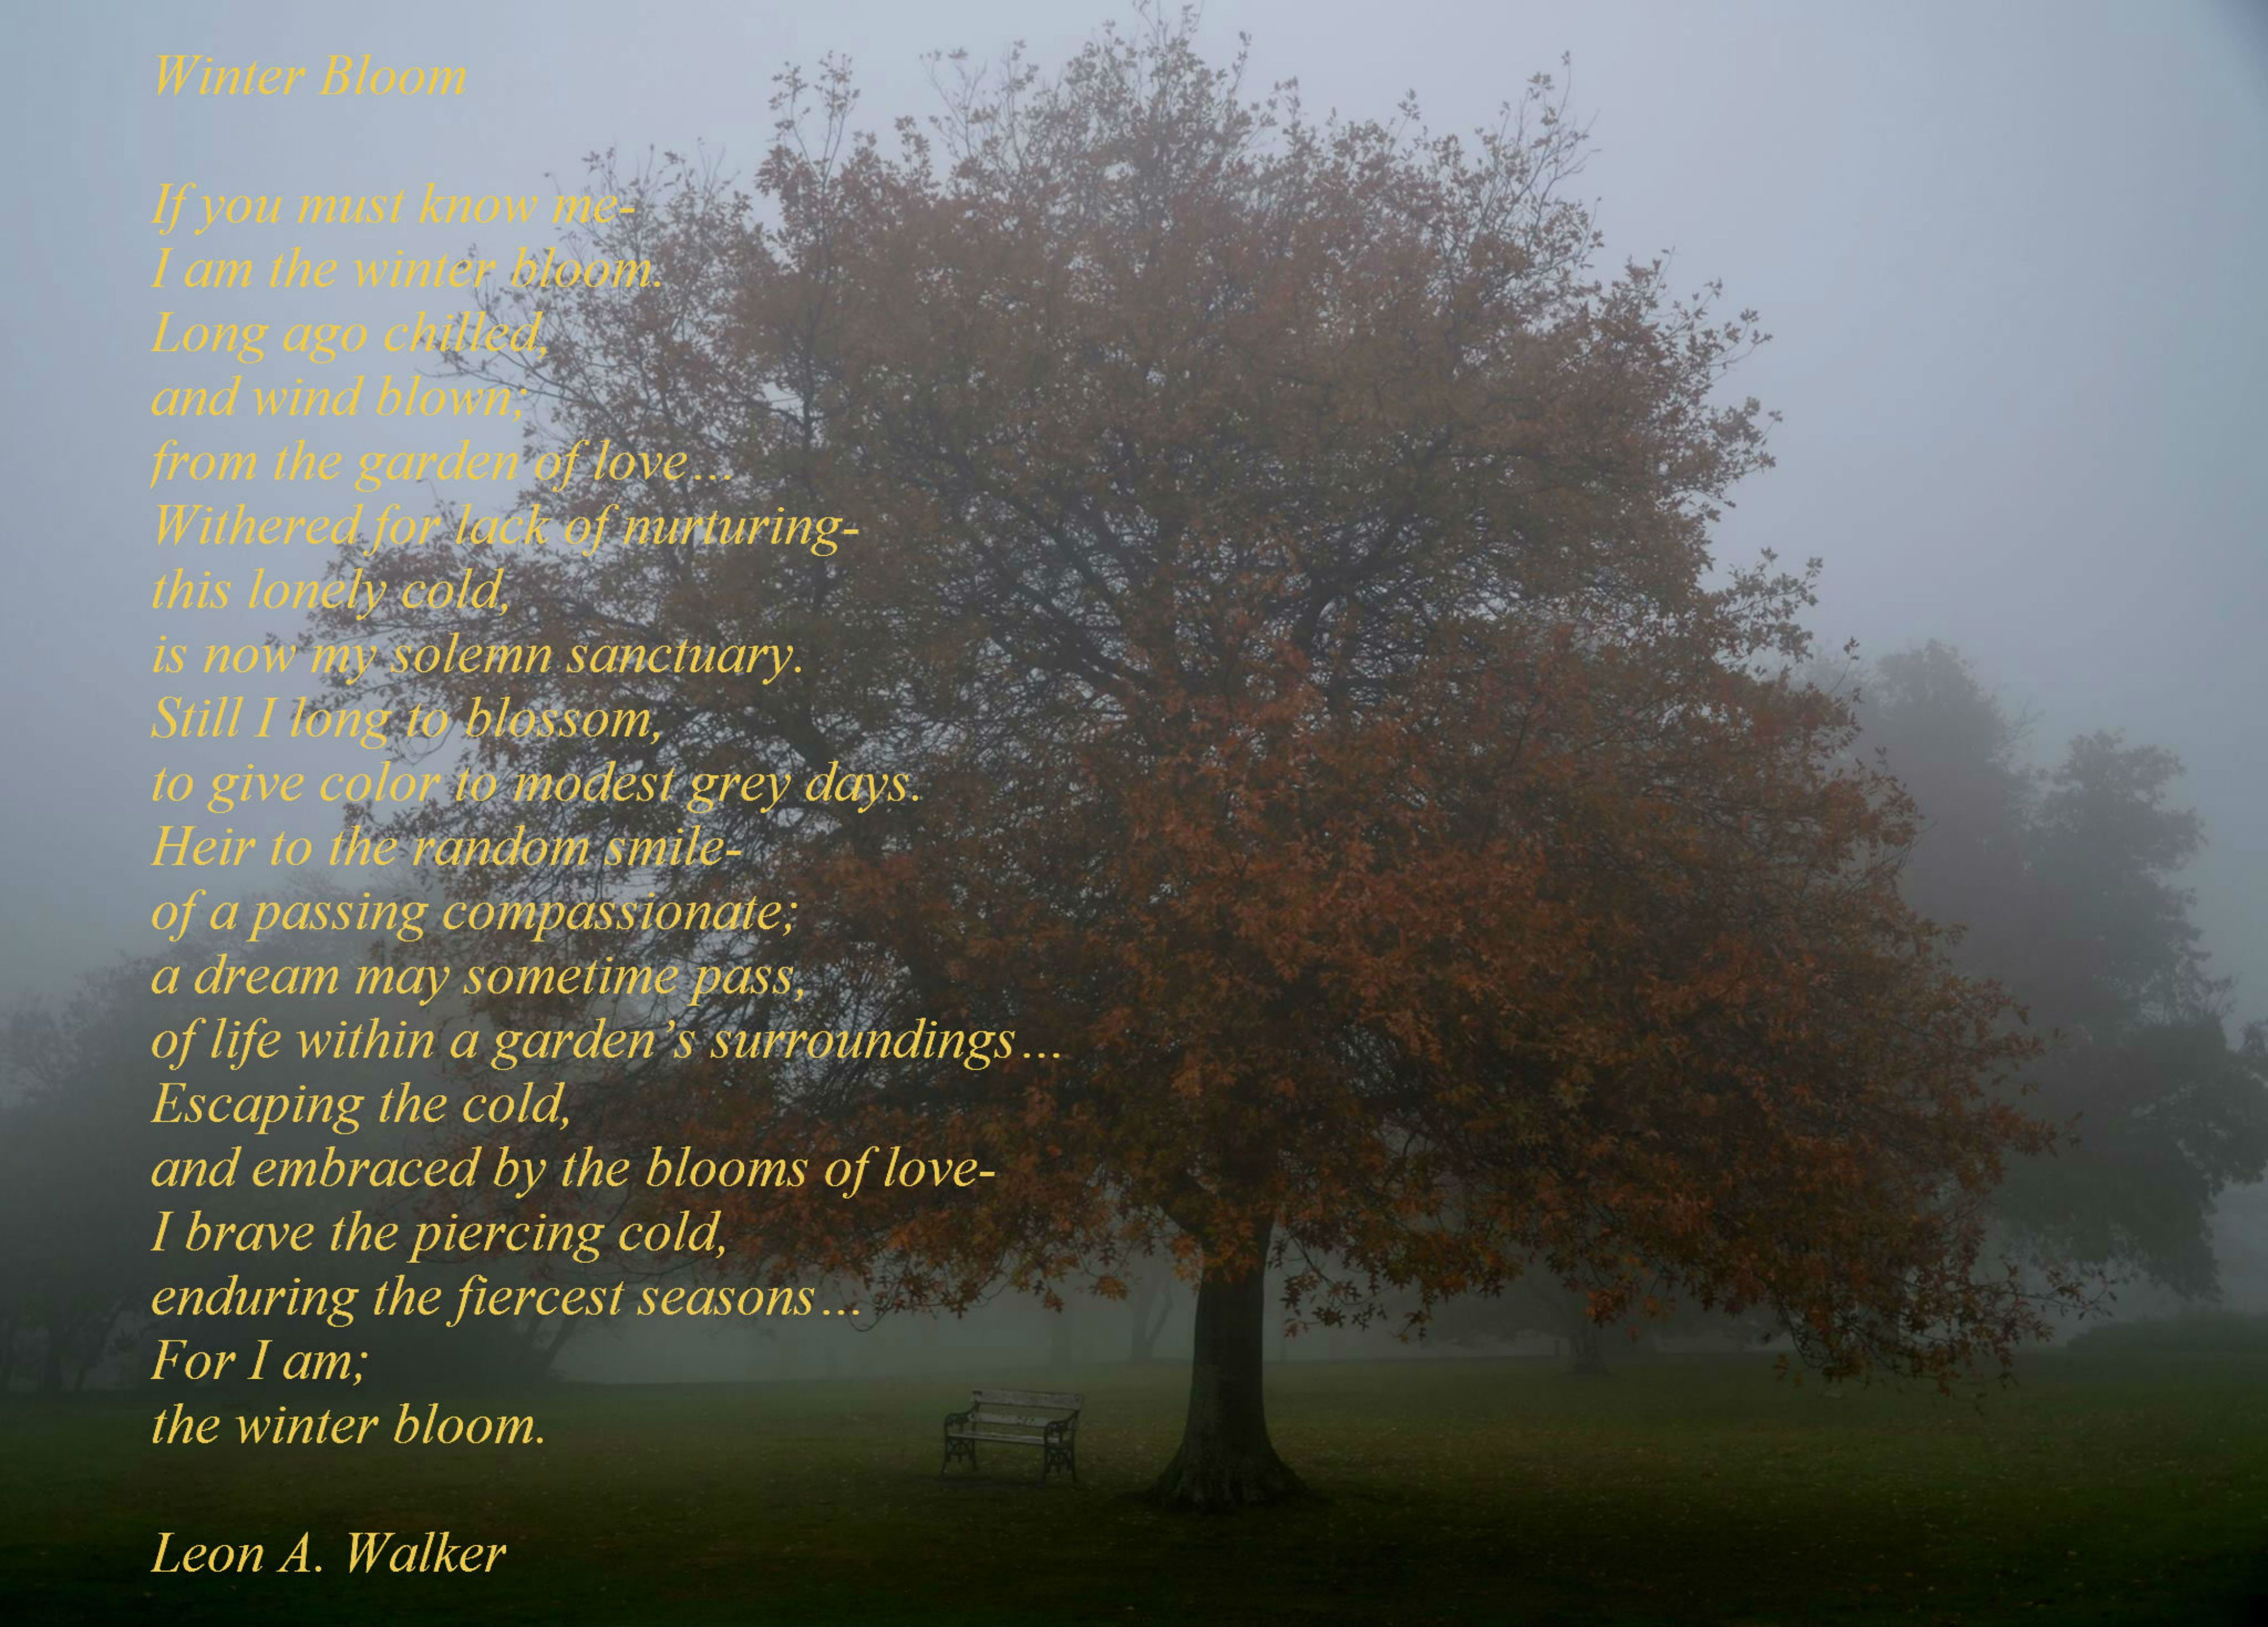 leon a walker u2013 winter bloom is from my book u201cequinox u201d u201cwinter